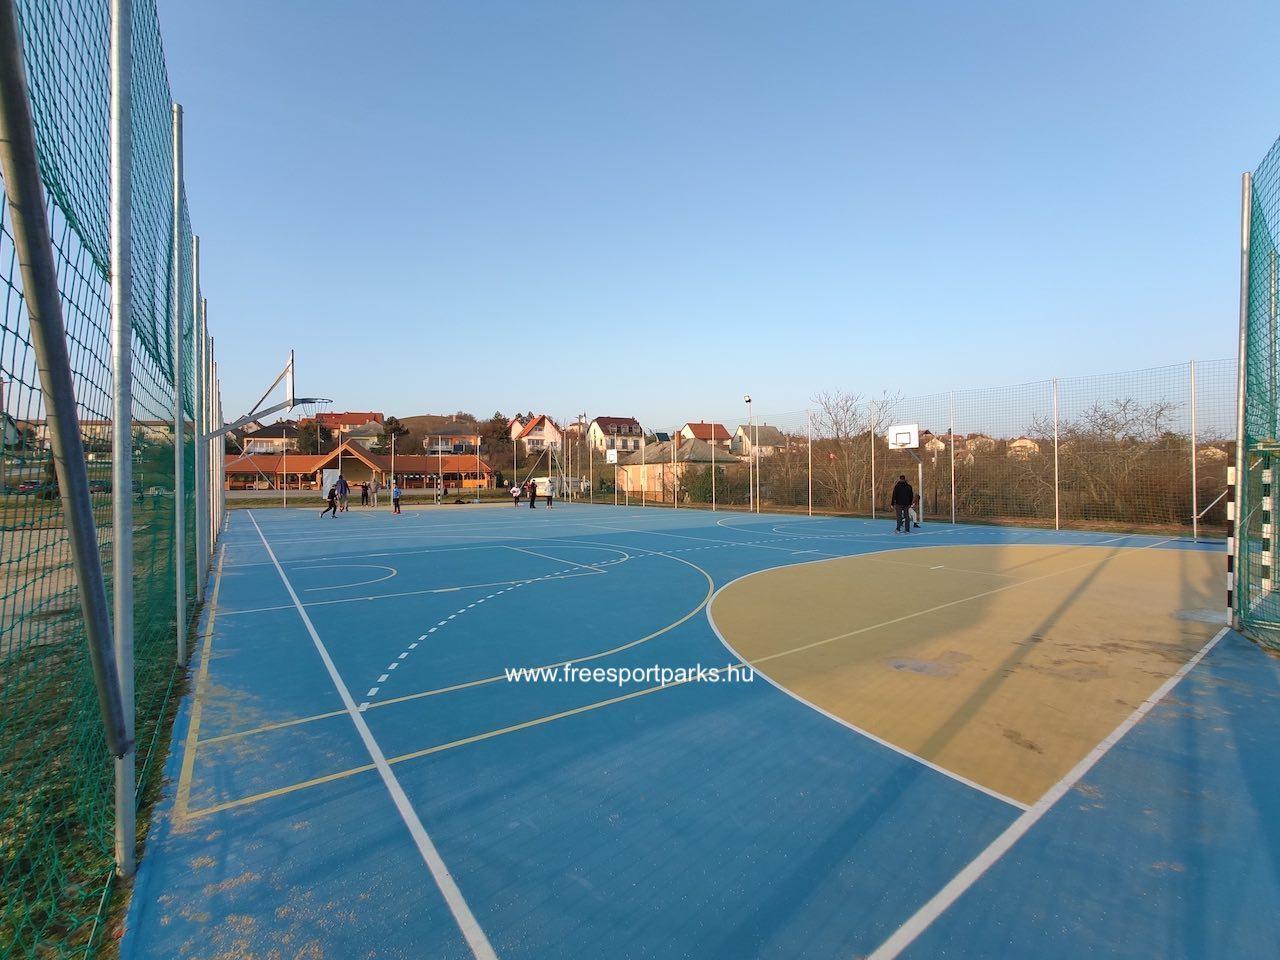 gumi talajú focipálya streetball pályákkal